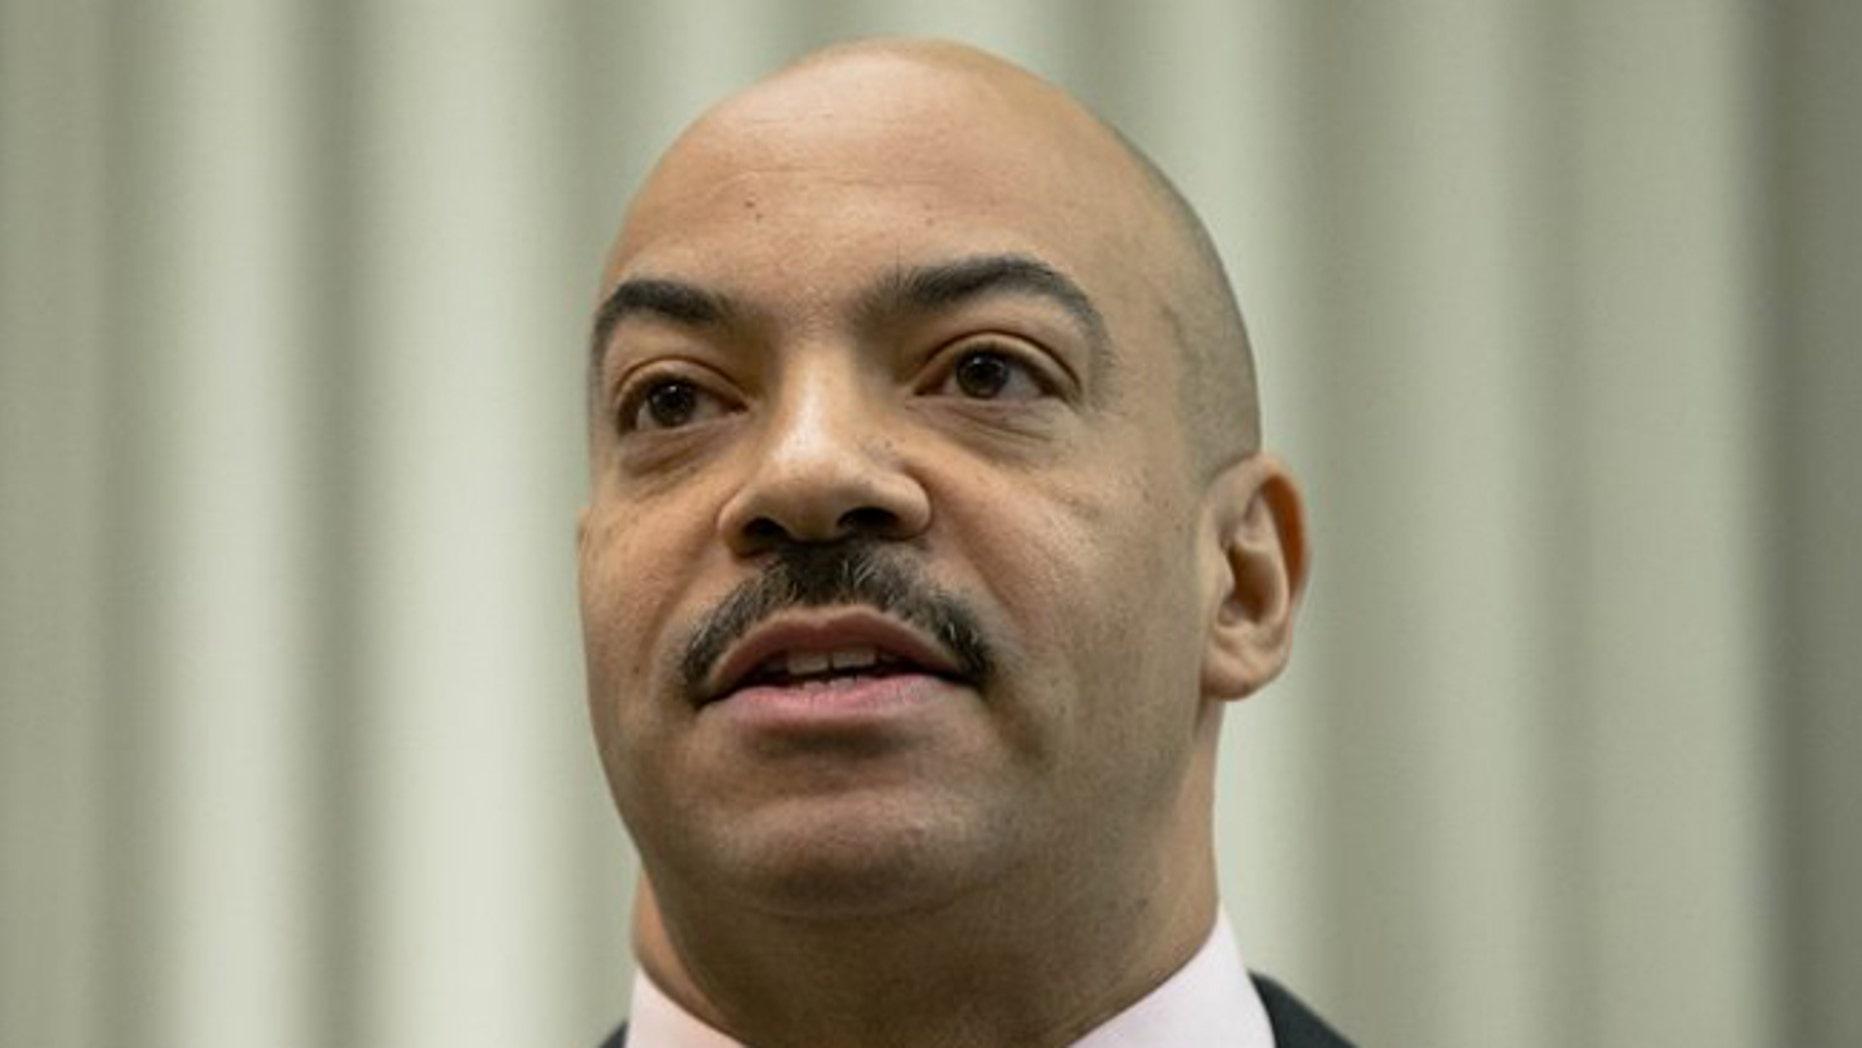 Philadelphia District Attorney Seth Williams